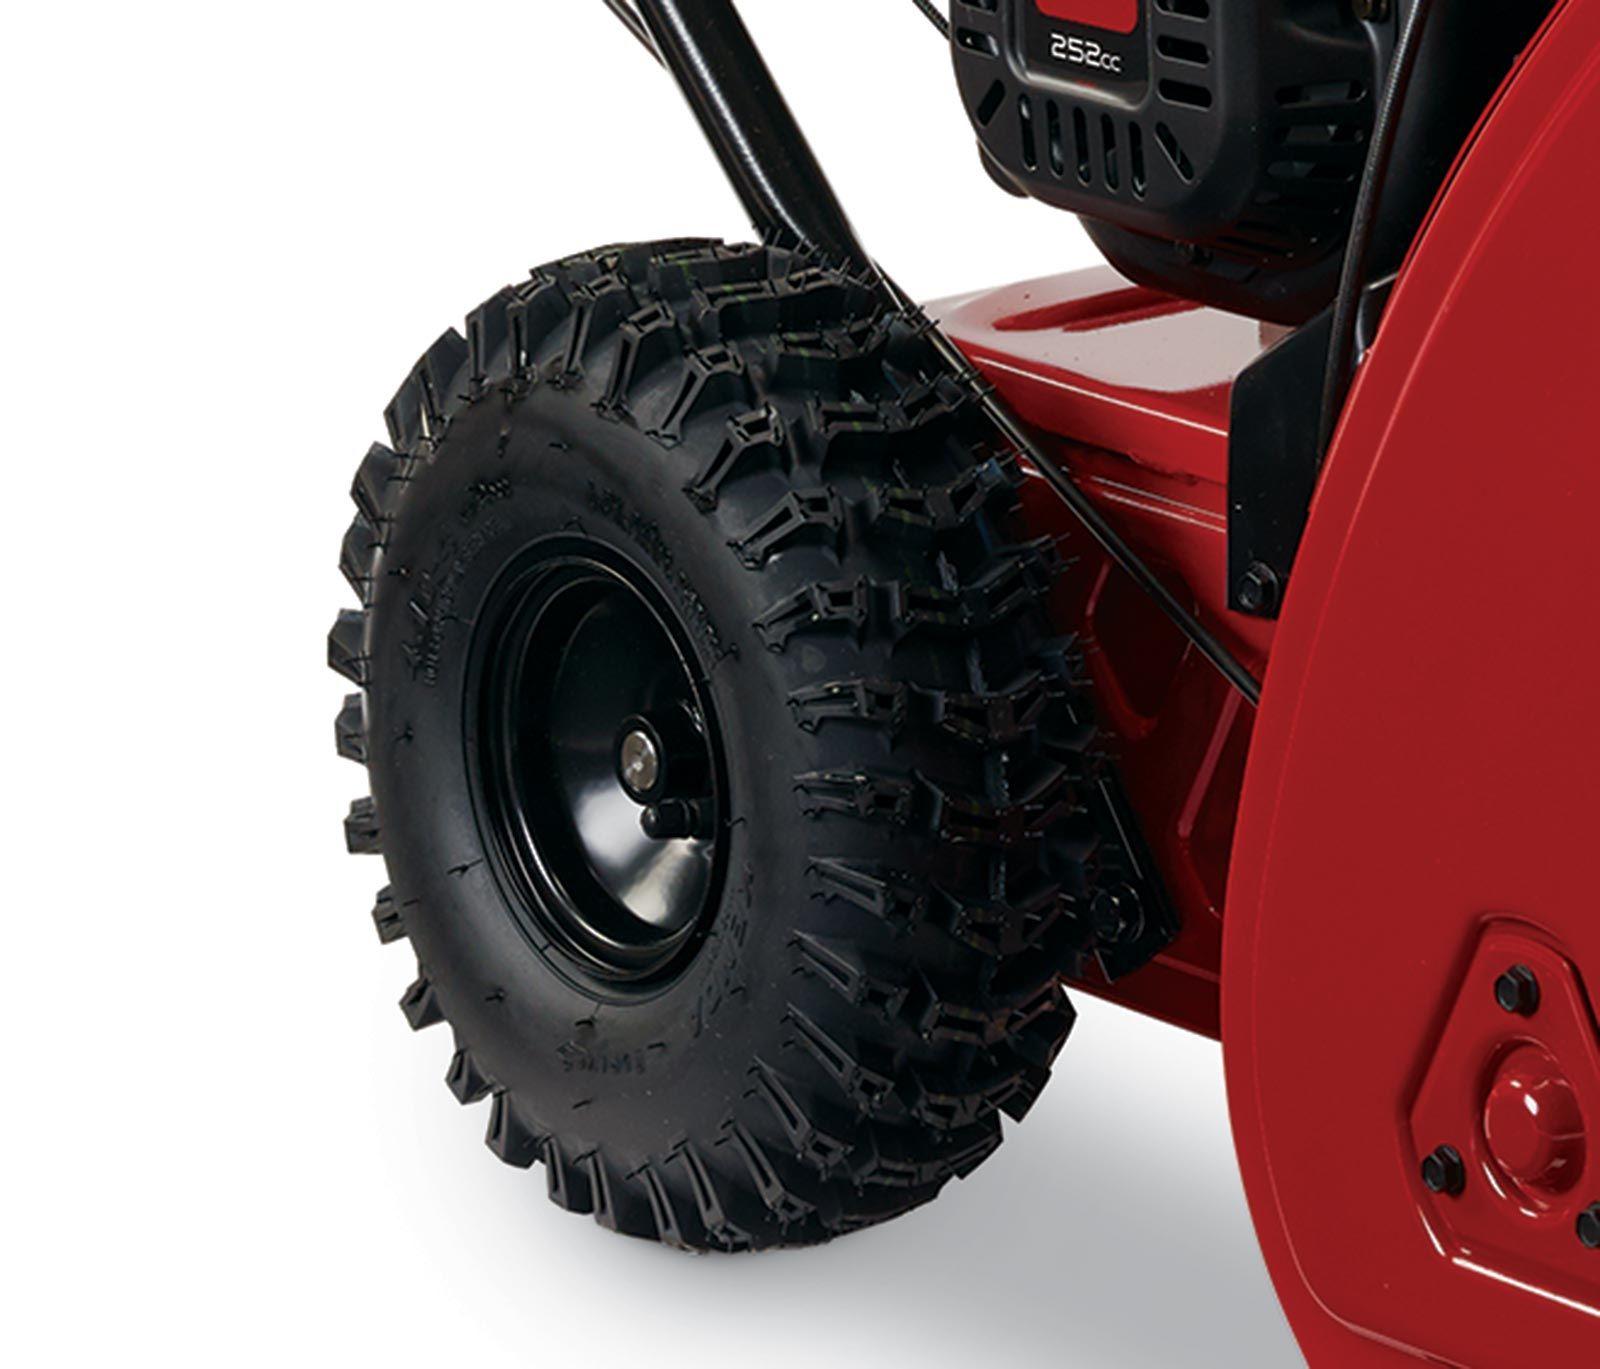 11 inch Deep Lug Tires - Directional deep lug wheels for added traction